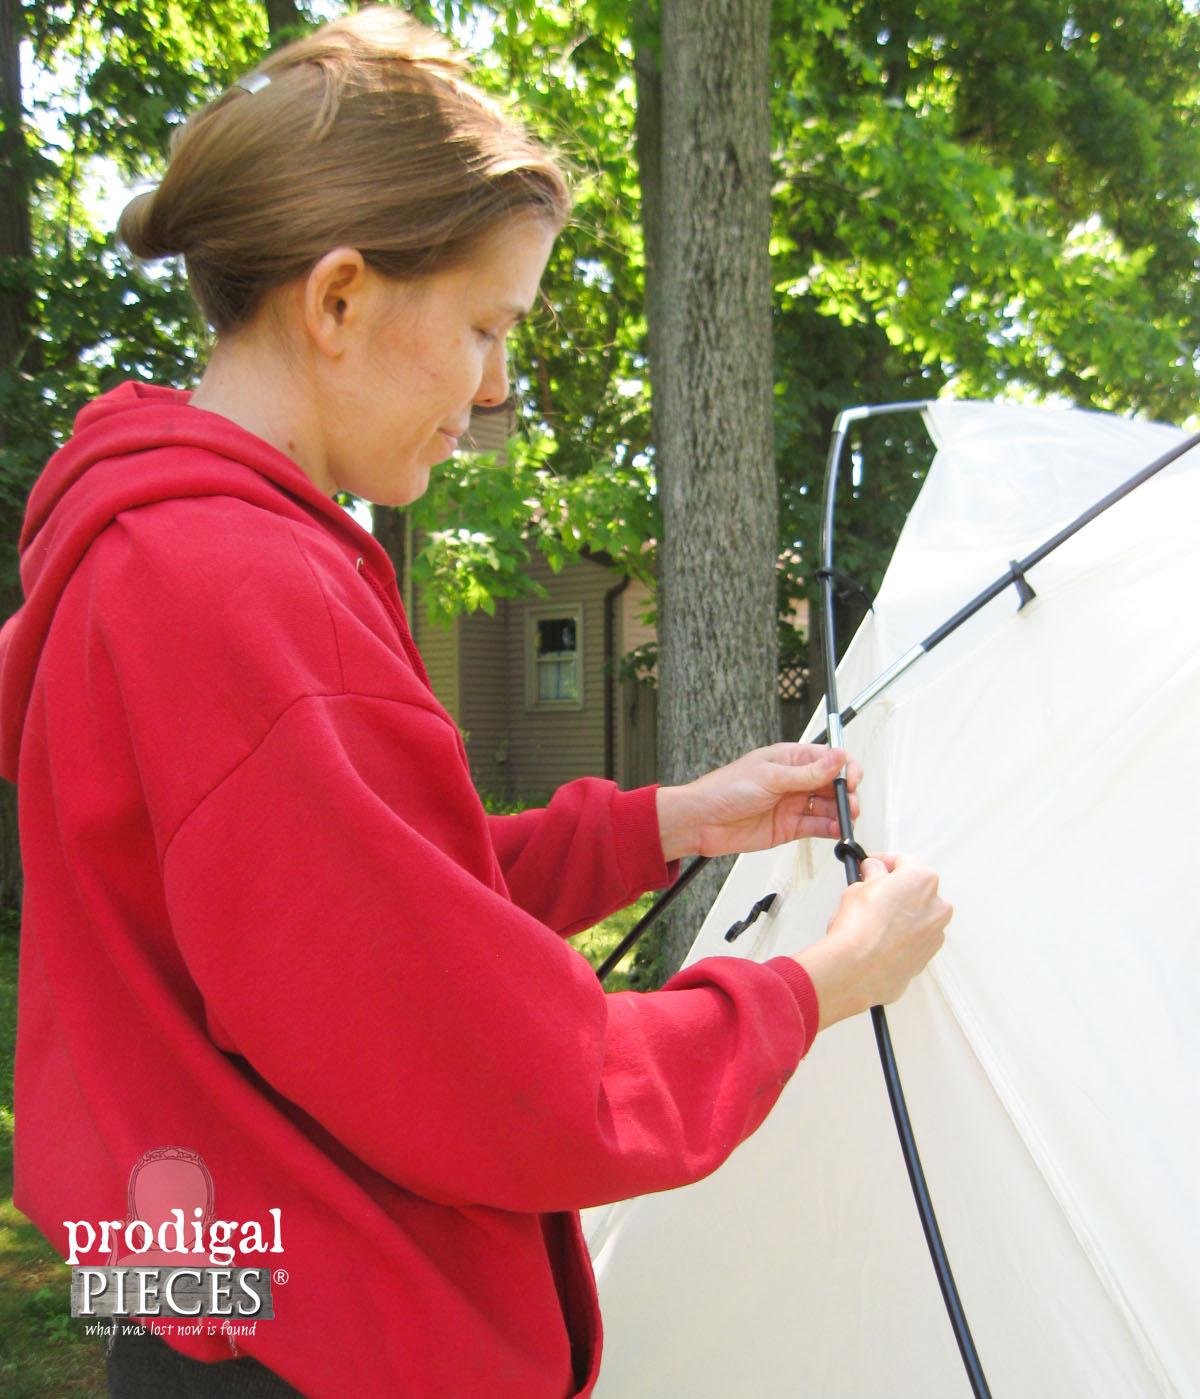 Setting Up HomeRight Spray Shelter | Prodigal Pieces | www.prodigalpieces.com